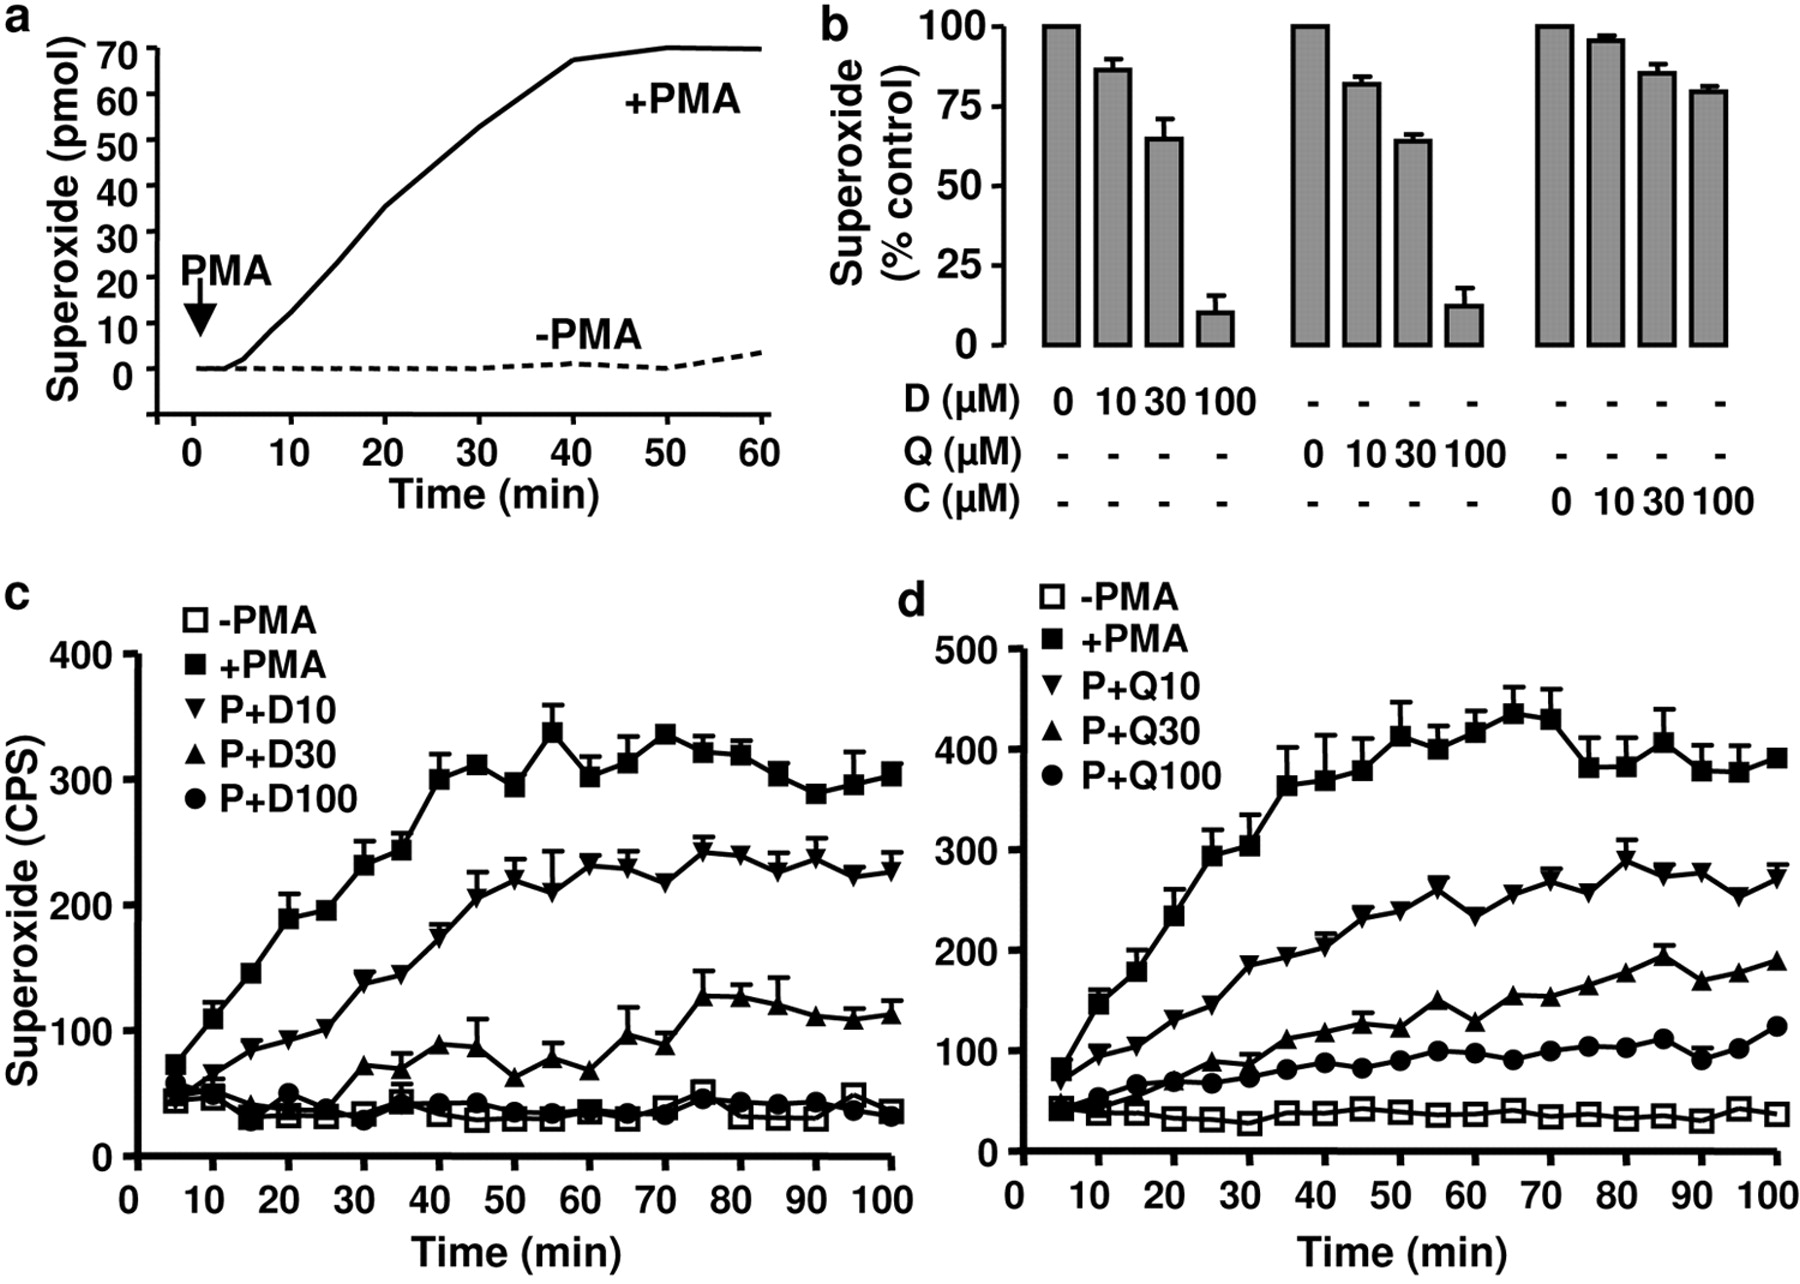 Modulation of Nicotinamide Adenine Dinucleotide Phosphate